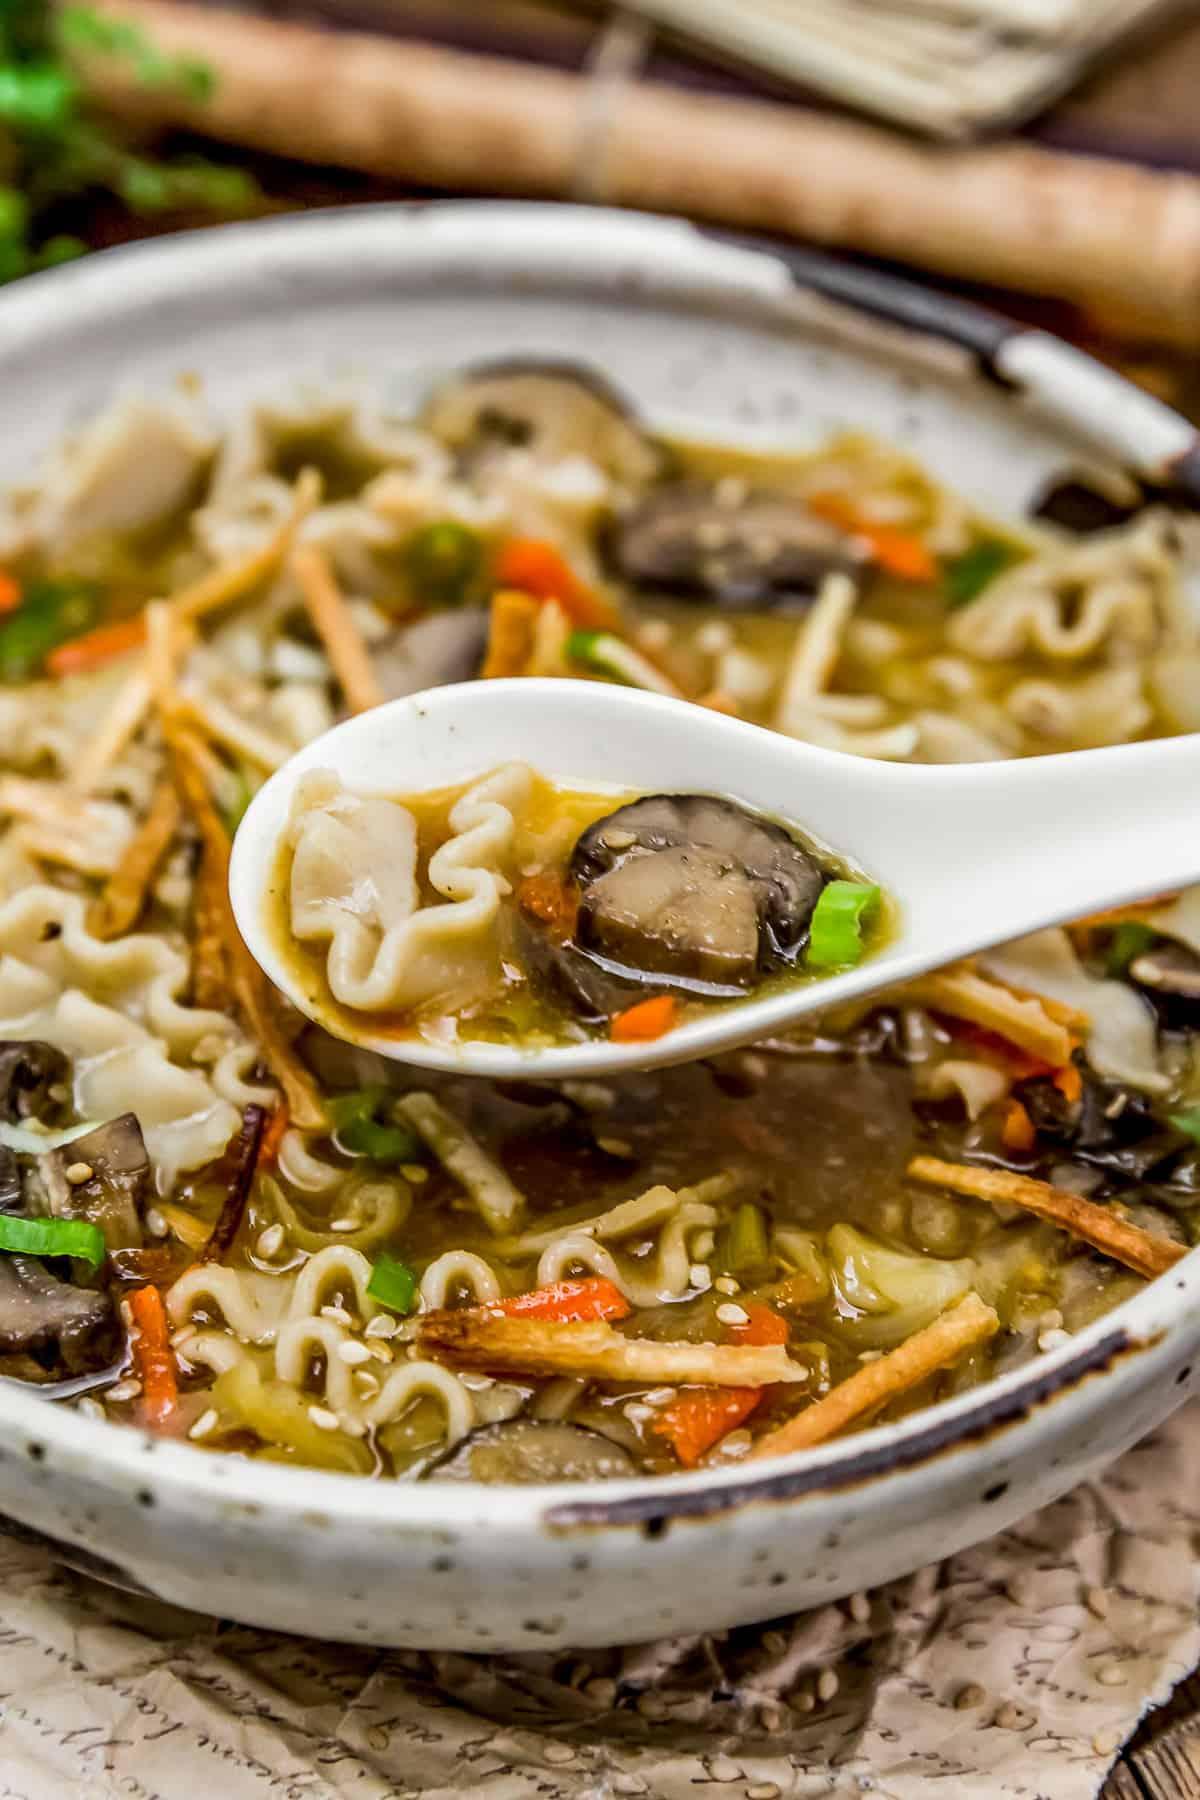 Eating Deconstructed Vegan Wonton Soup